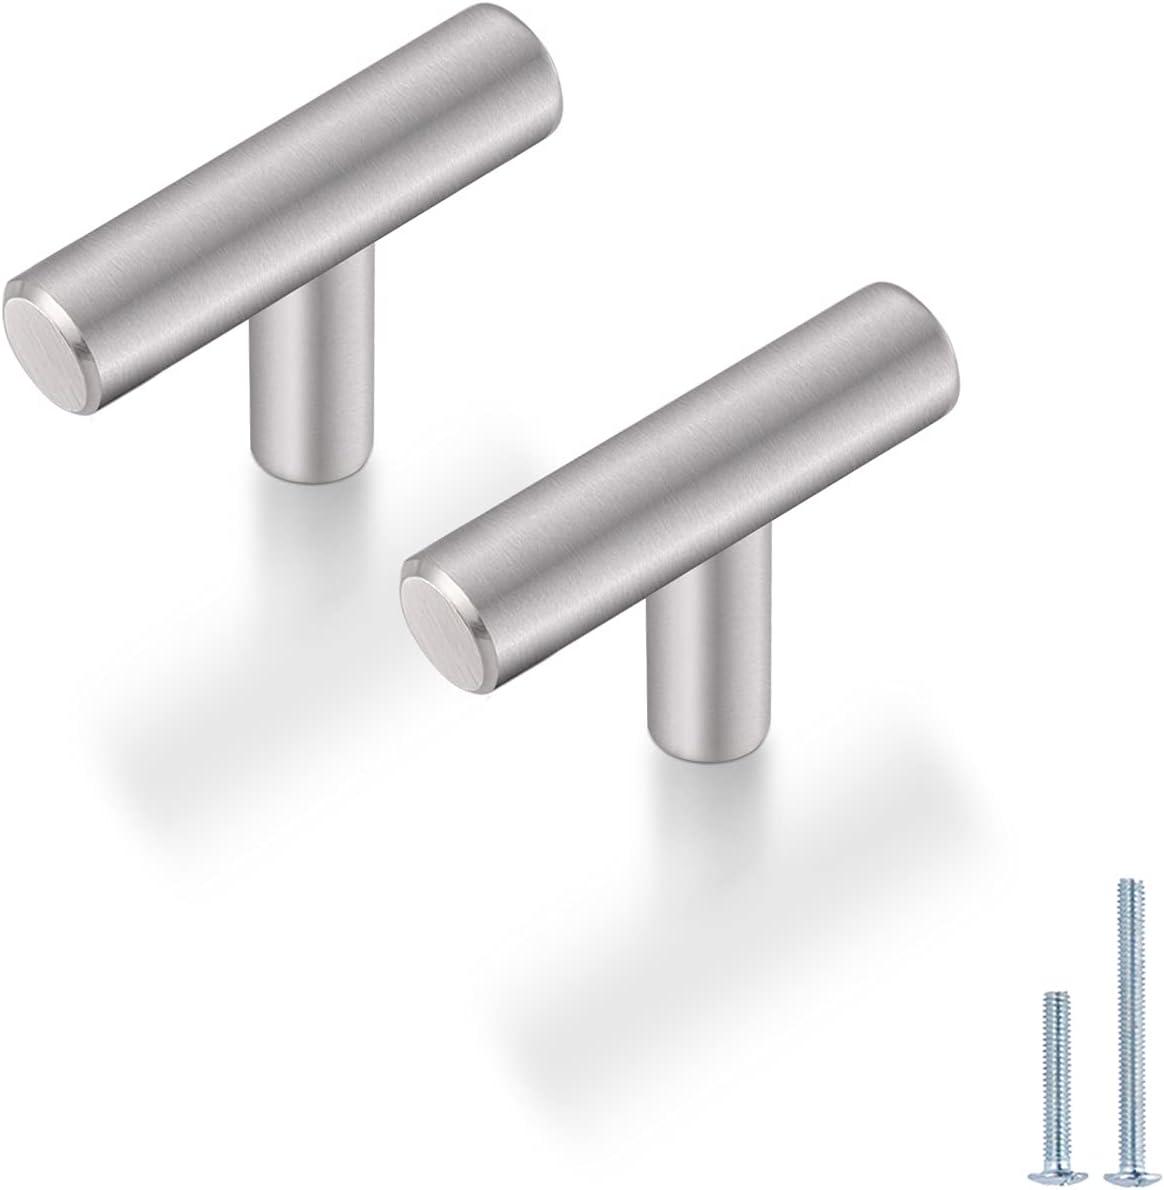 Buy Probrico 10 Pack 2 Inch Stainless Steel Kitchen Cabinet Door Knobs Satin Nickel Euro Style Round T Bar Hardware Single Hole Drawer Dresser Knobs For Cupboard Bathroom Bedroom Online In Turkey B0868gtr7w